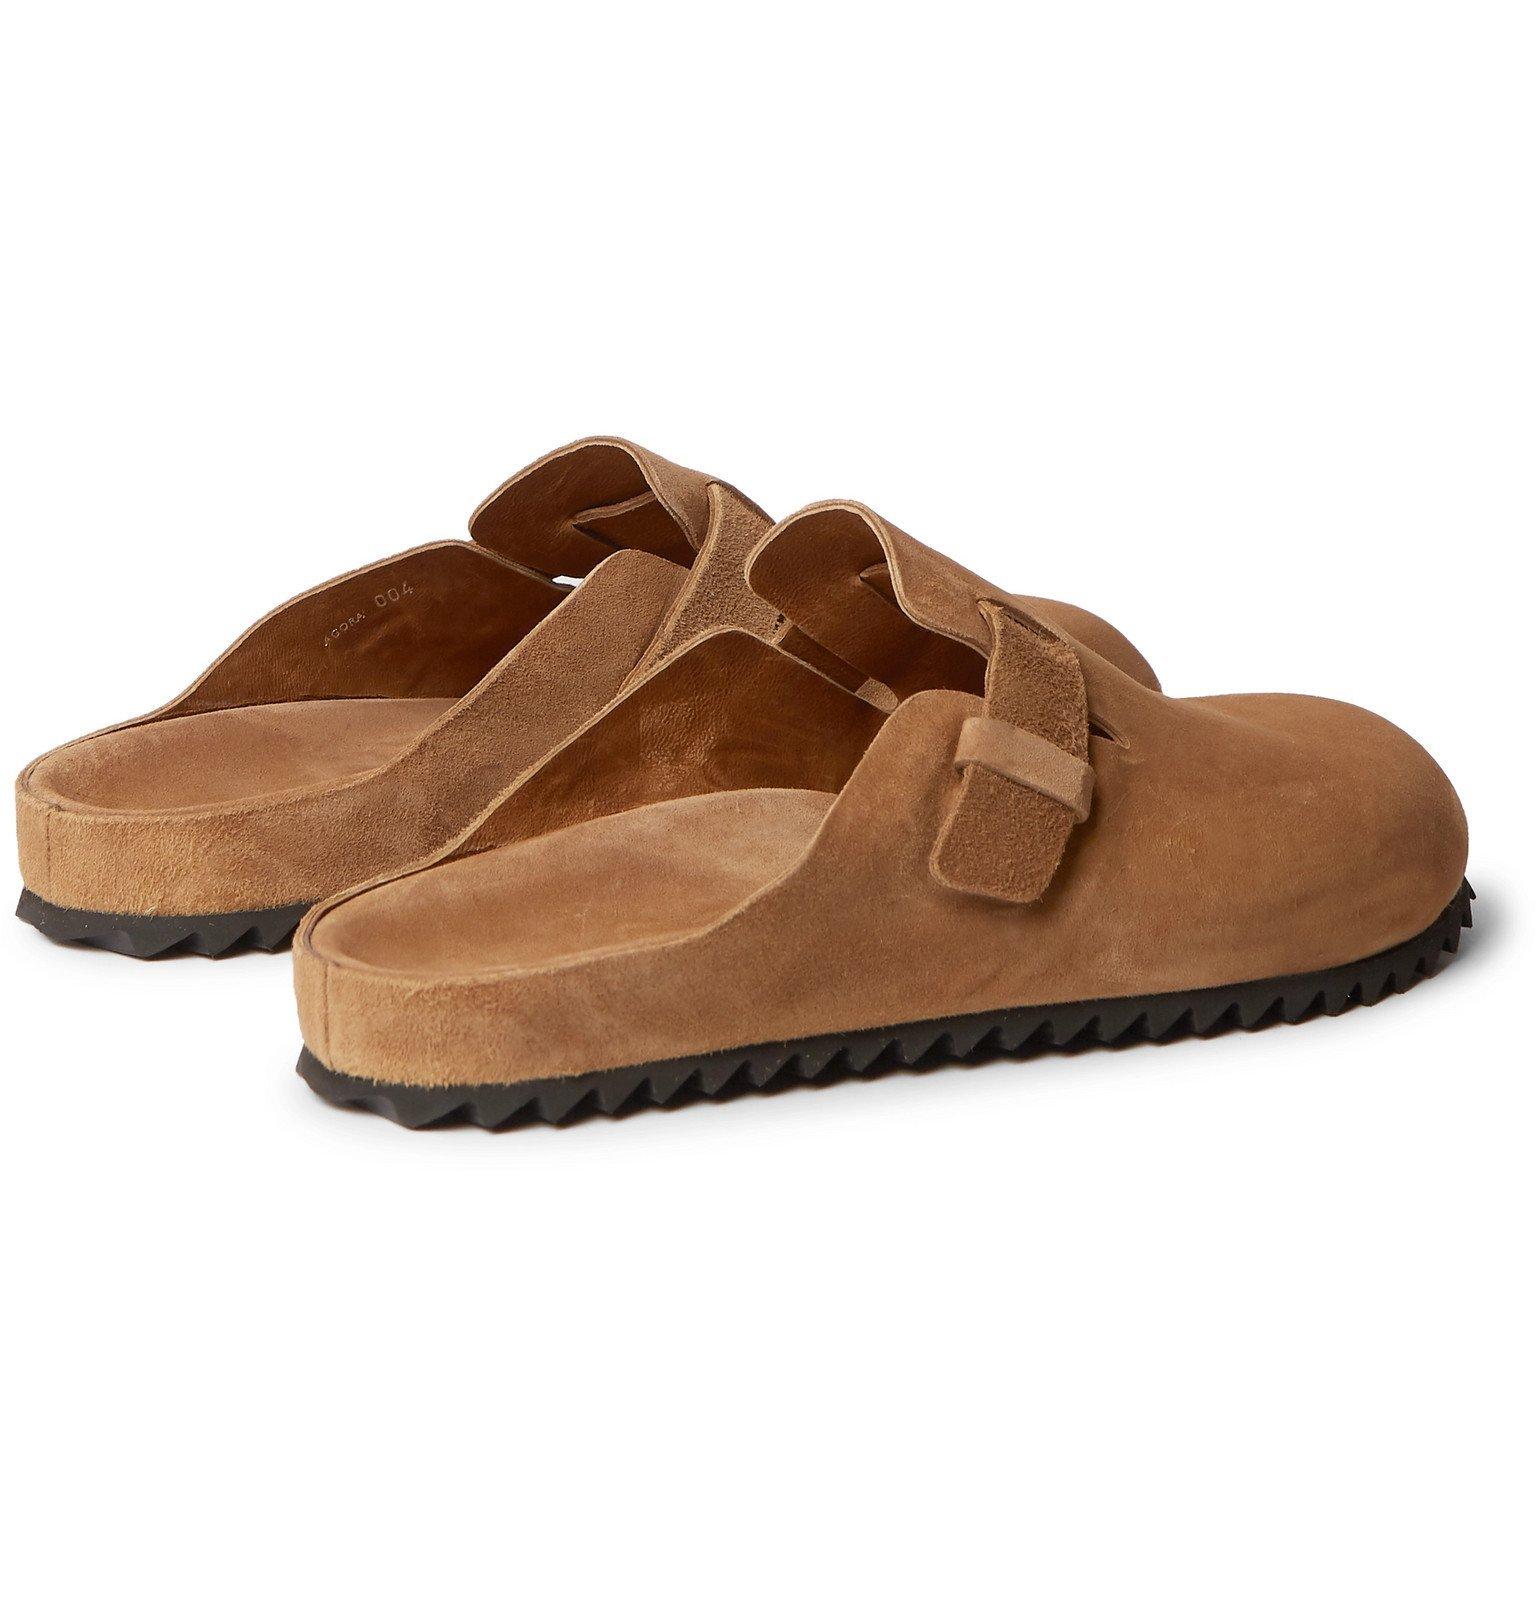 Officine Creative - Agora Leather Sandals - Neutrals